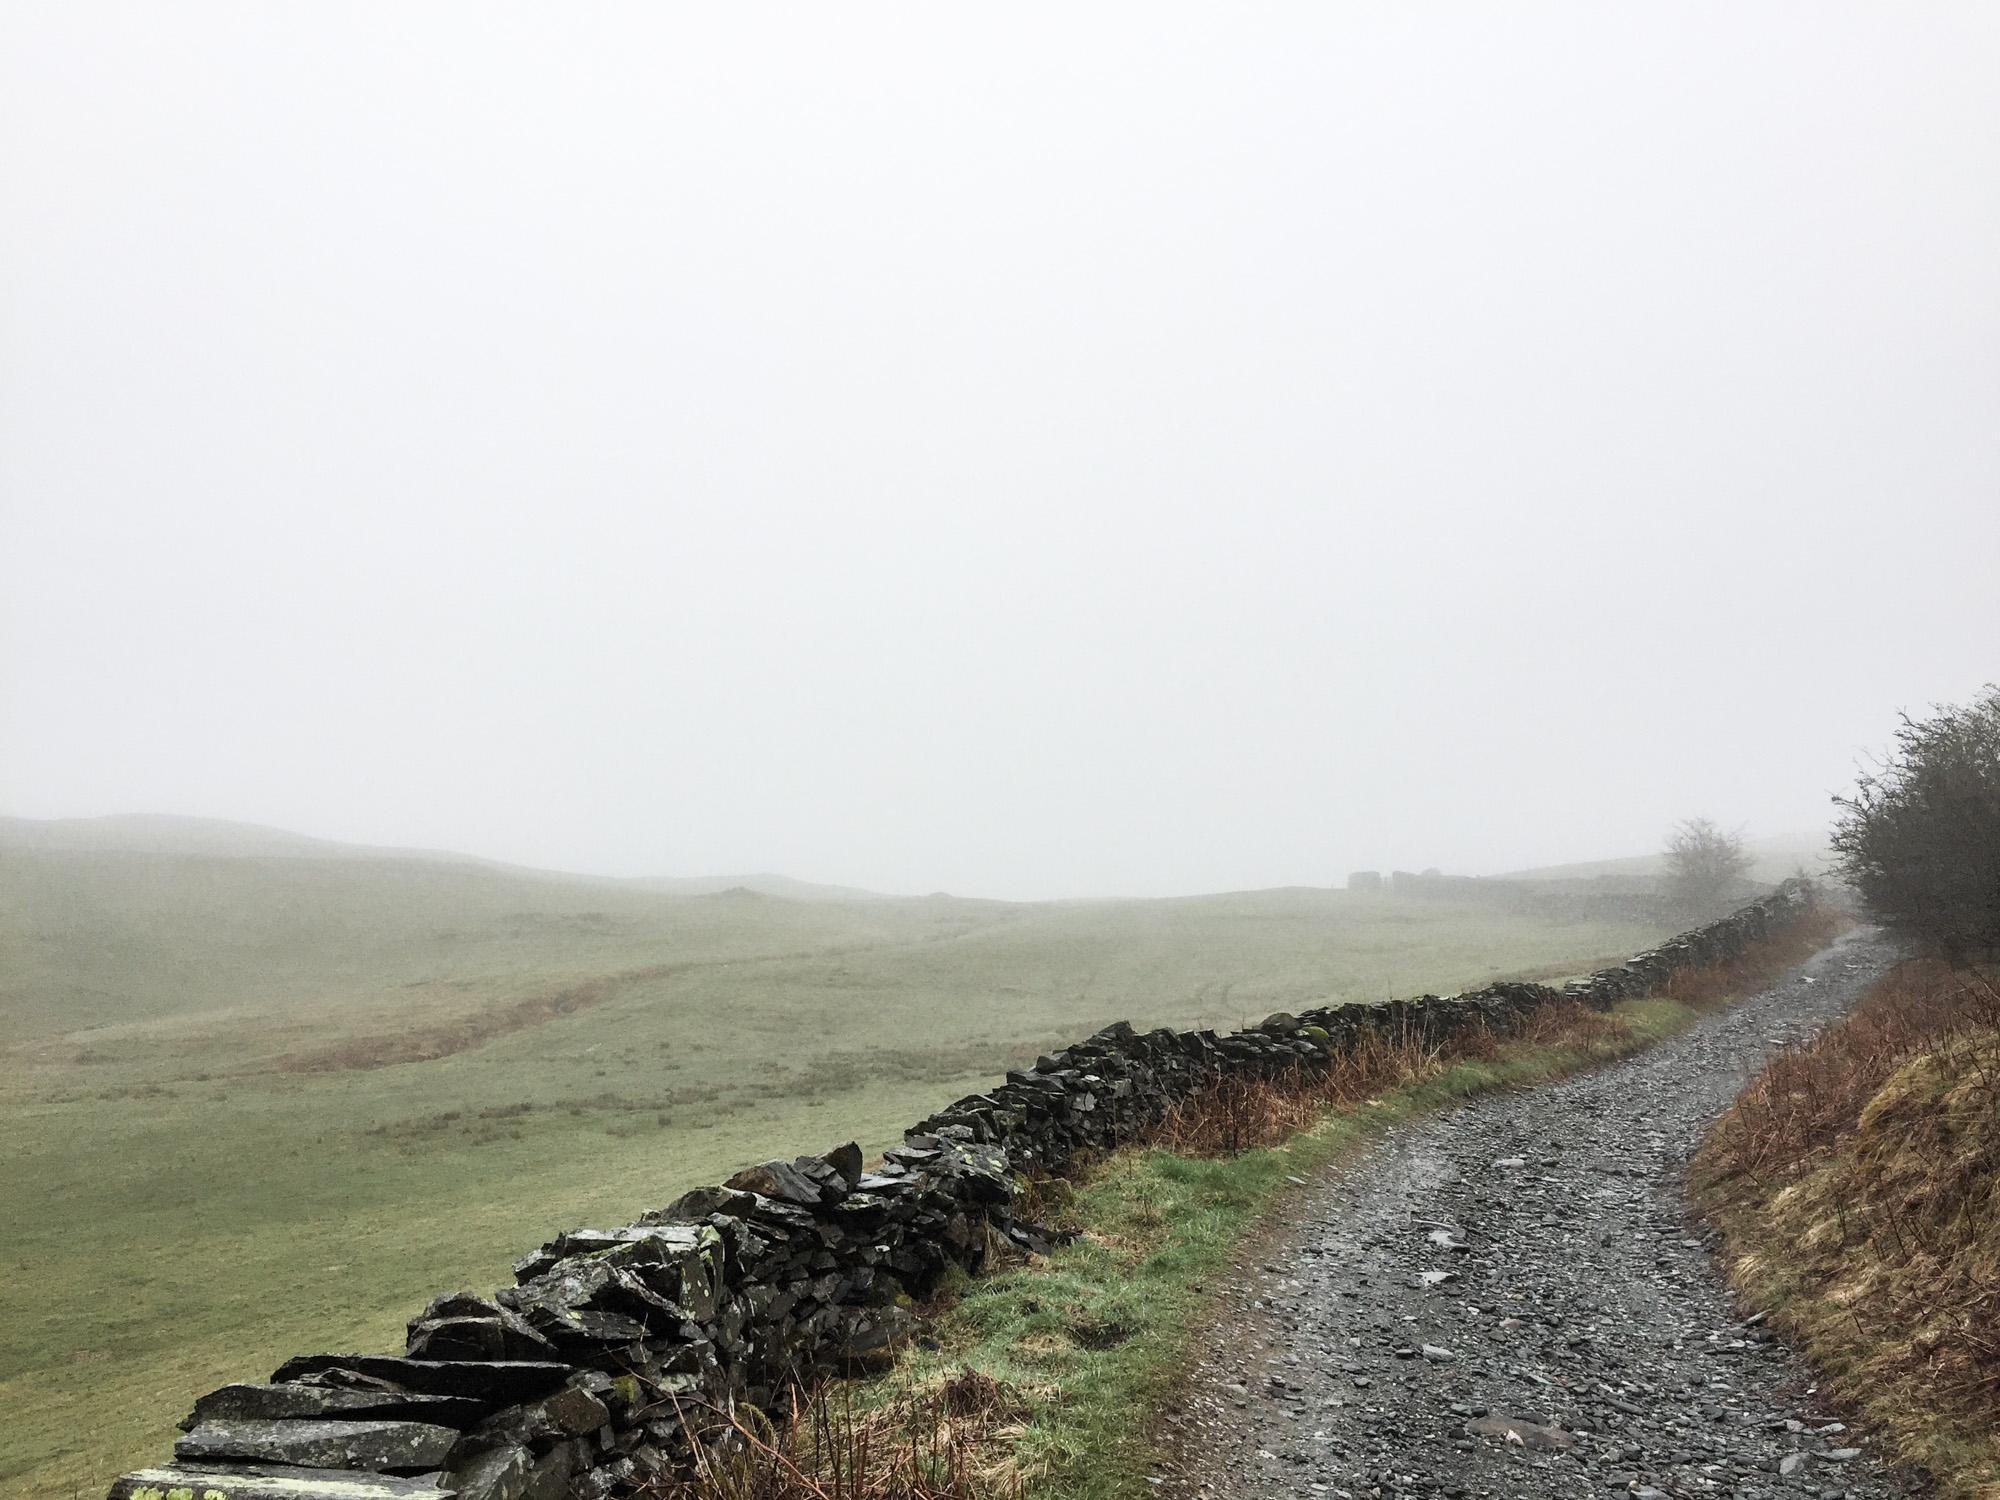 Gravel road past Dubbs Reservoir